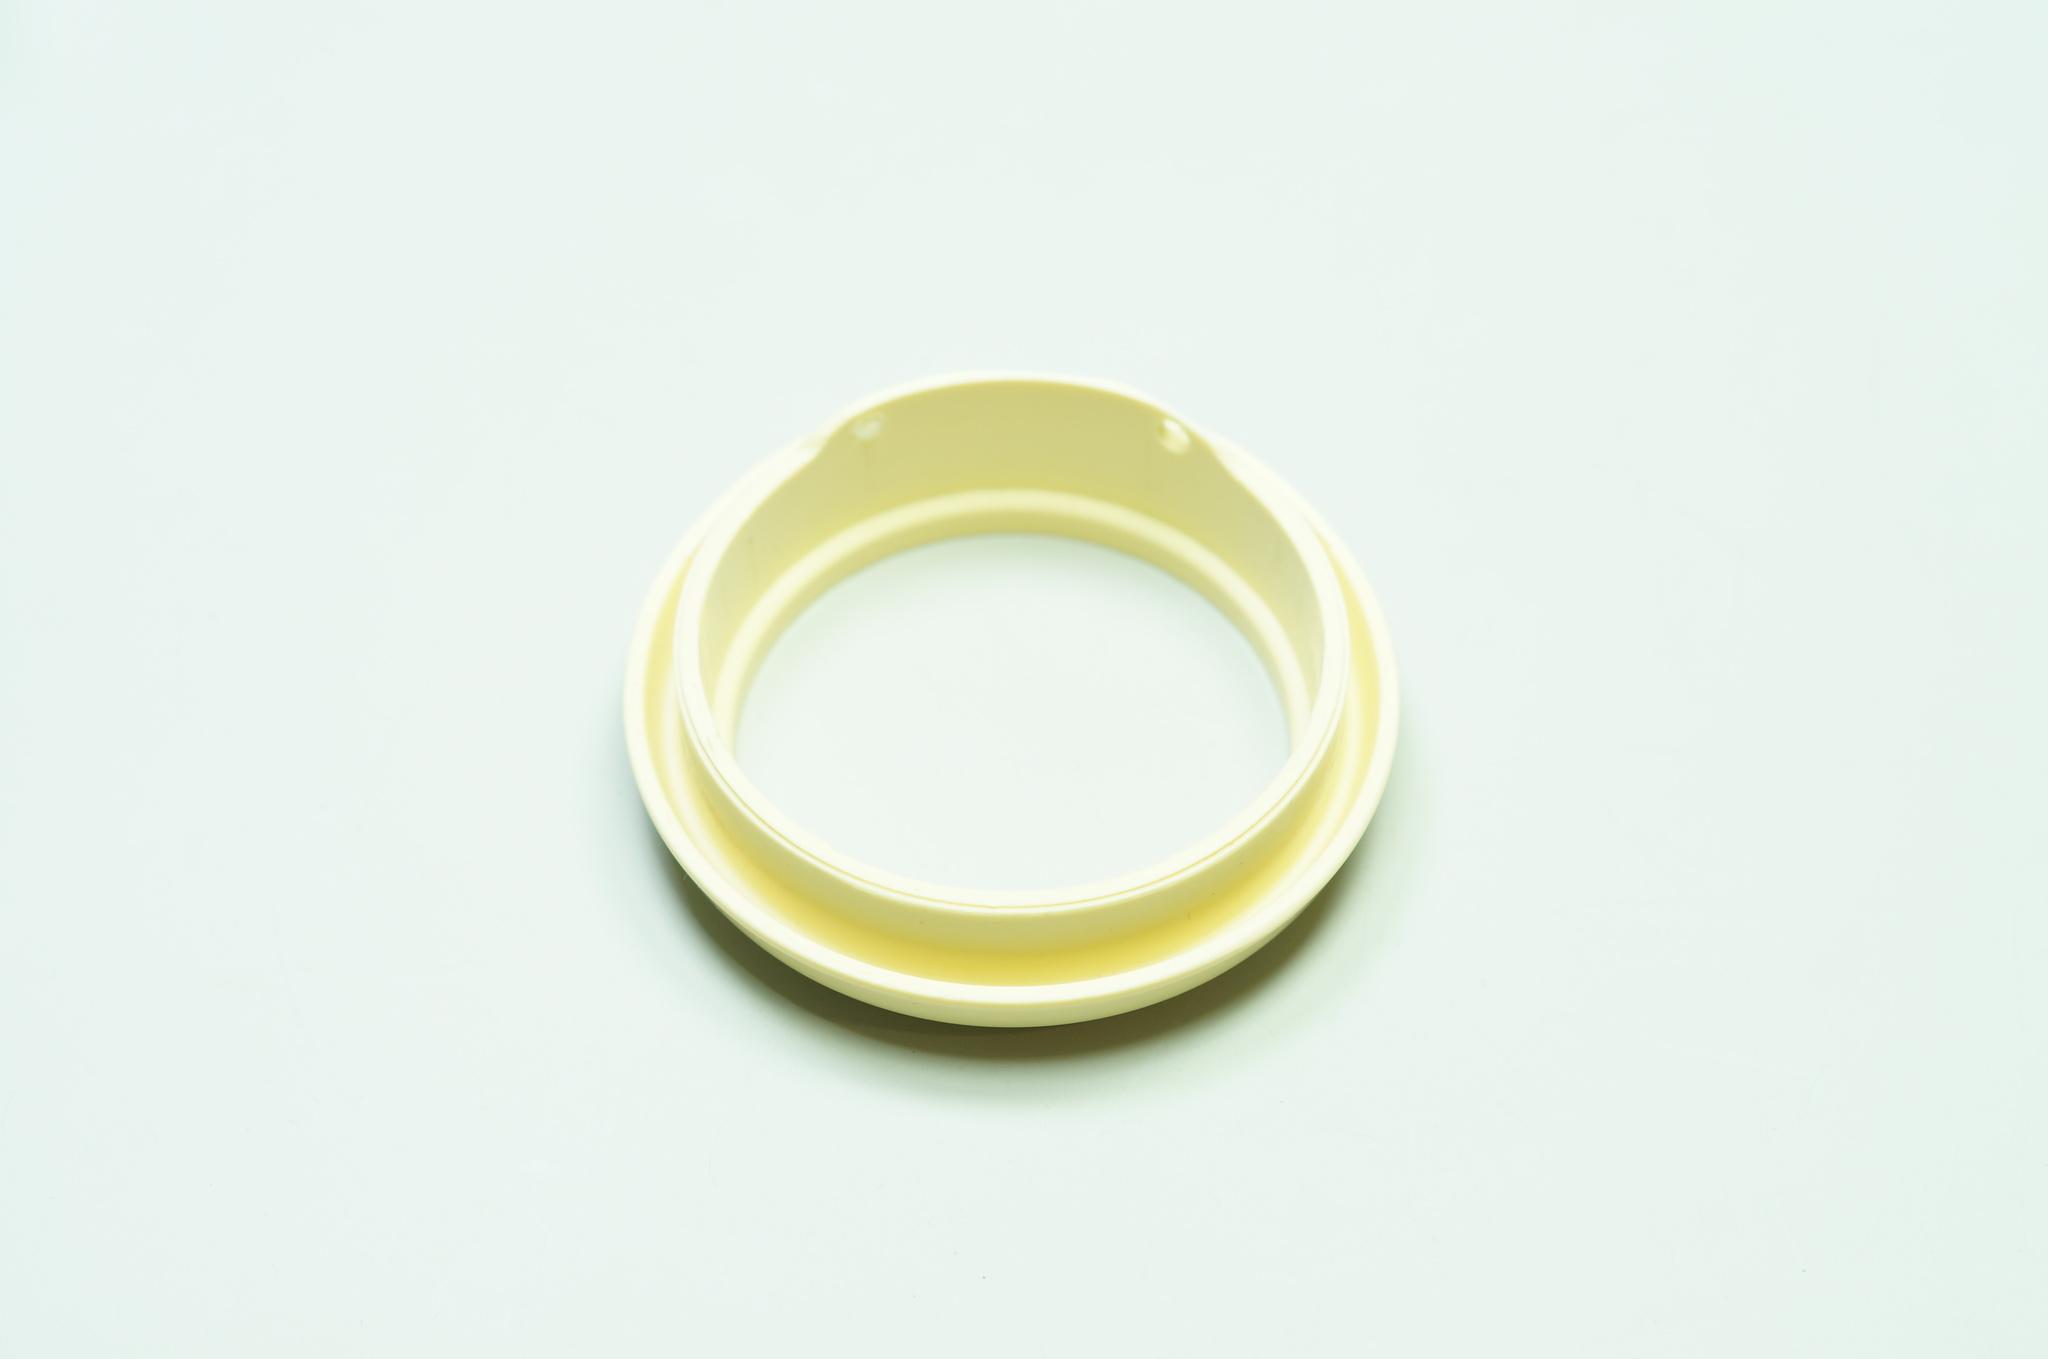 Кольцо эмблемы руля Заз 965, Москвич 407